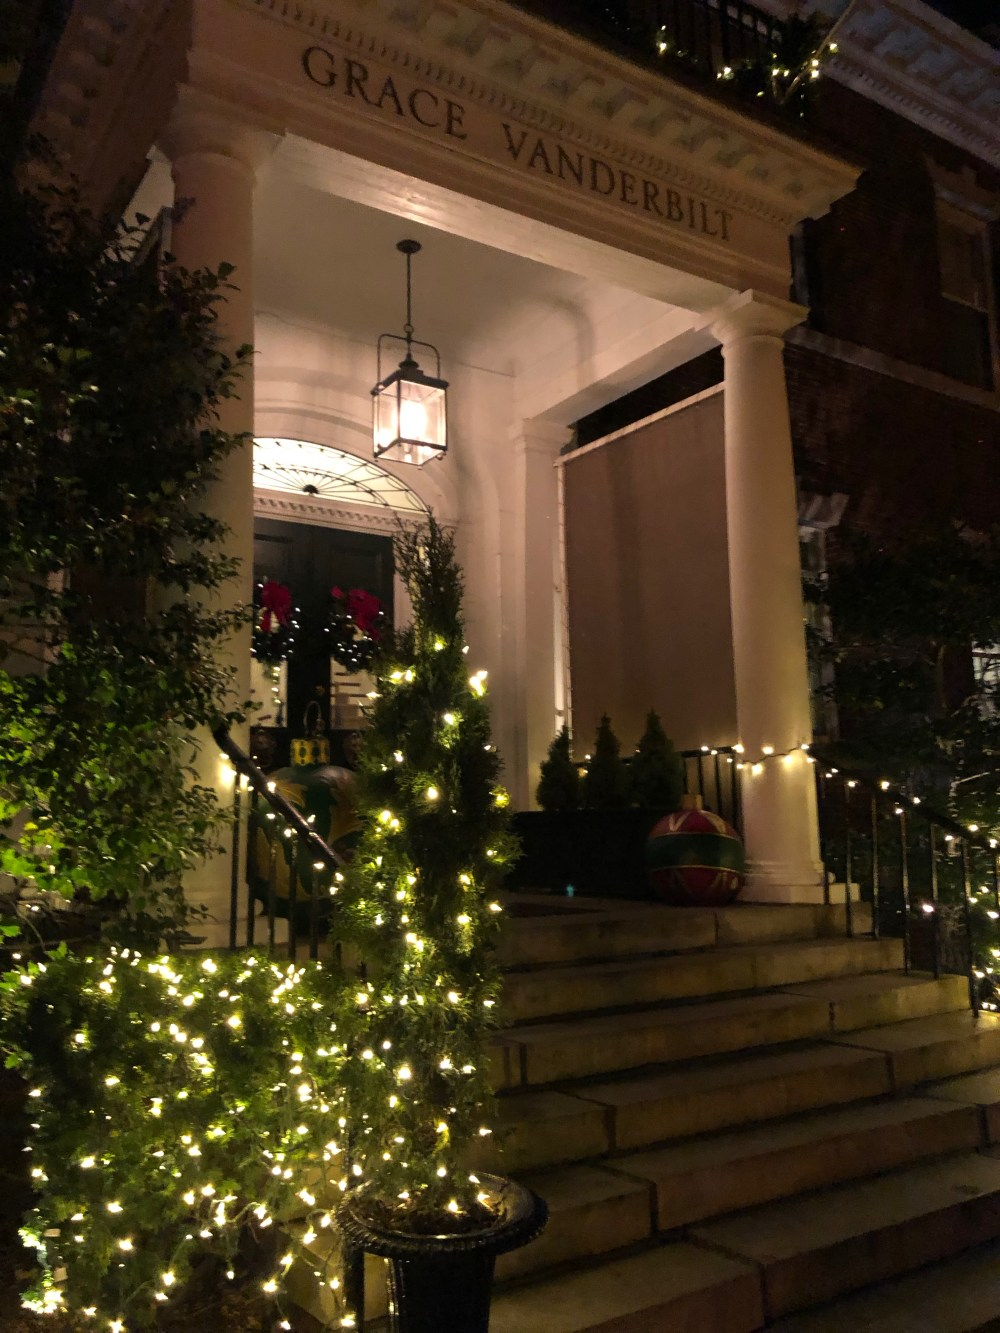 Grace Vanderbilt Restaurant, Newport